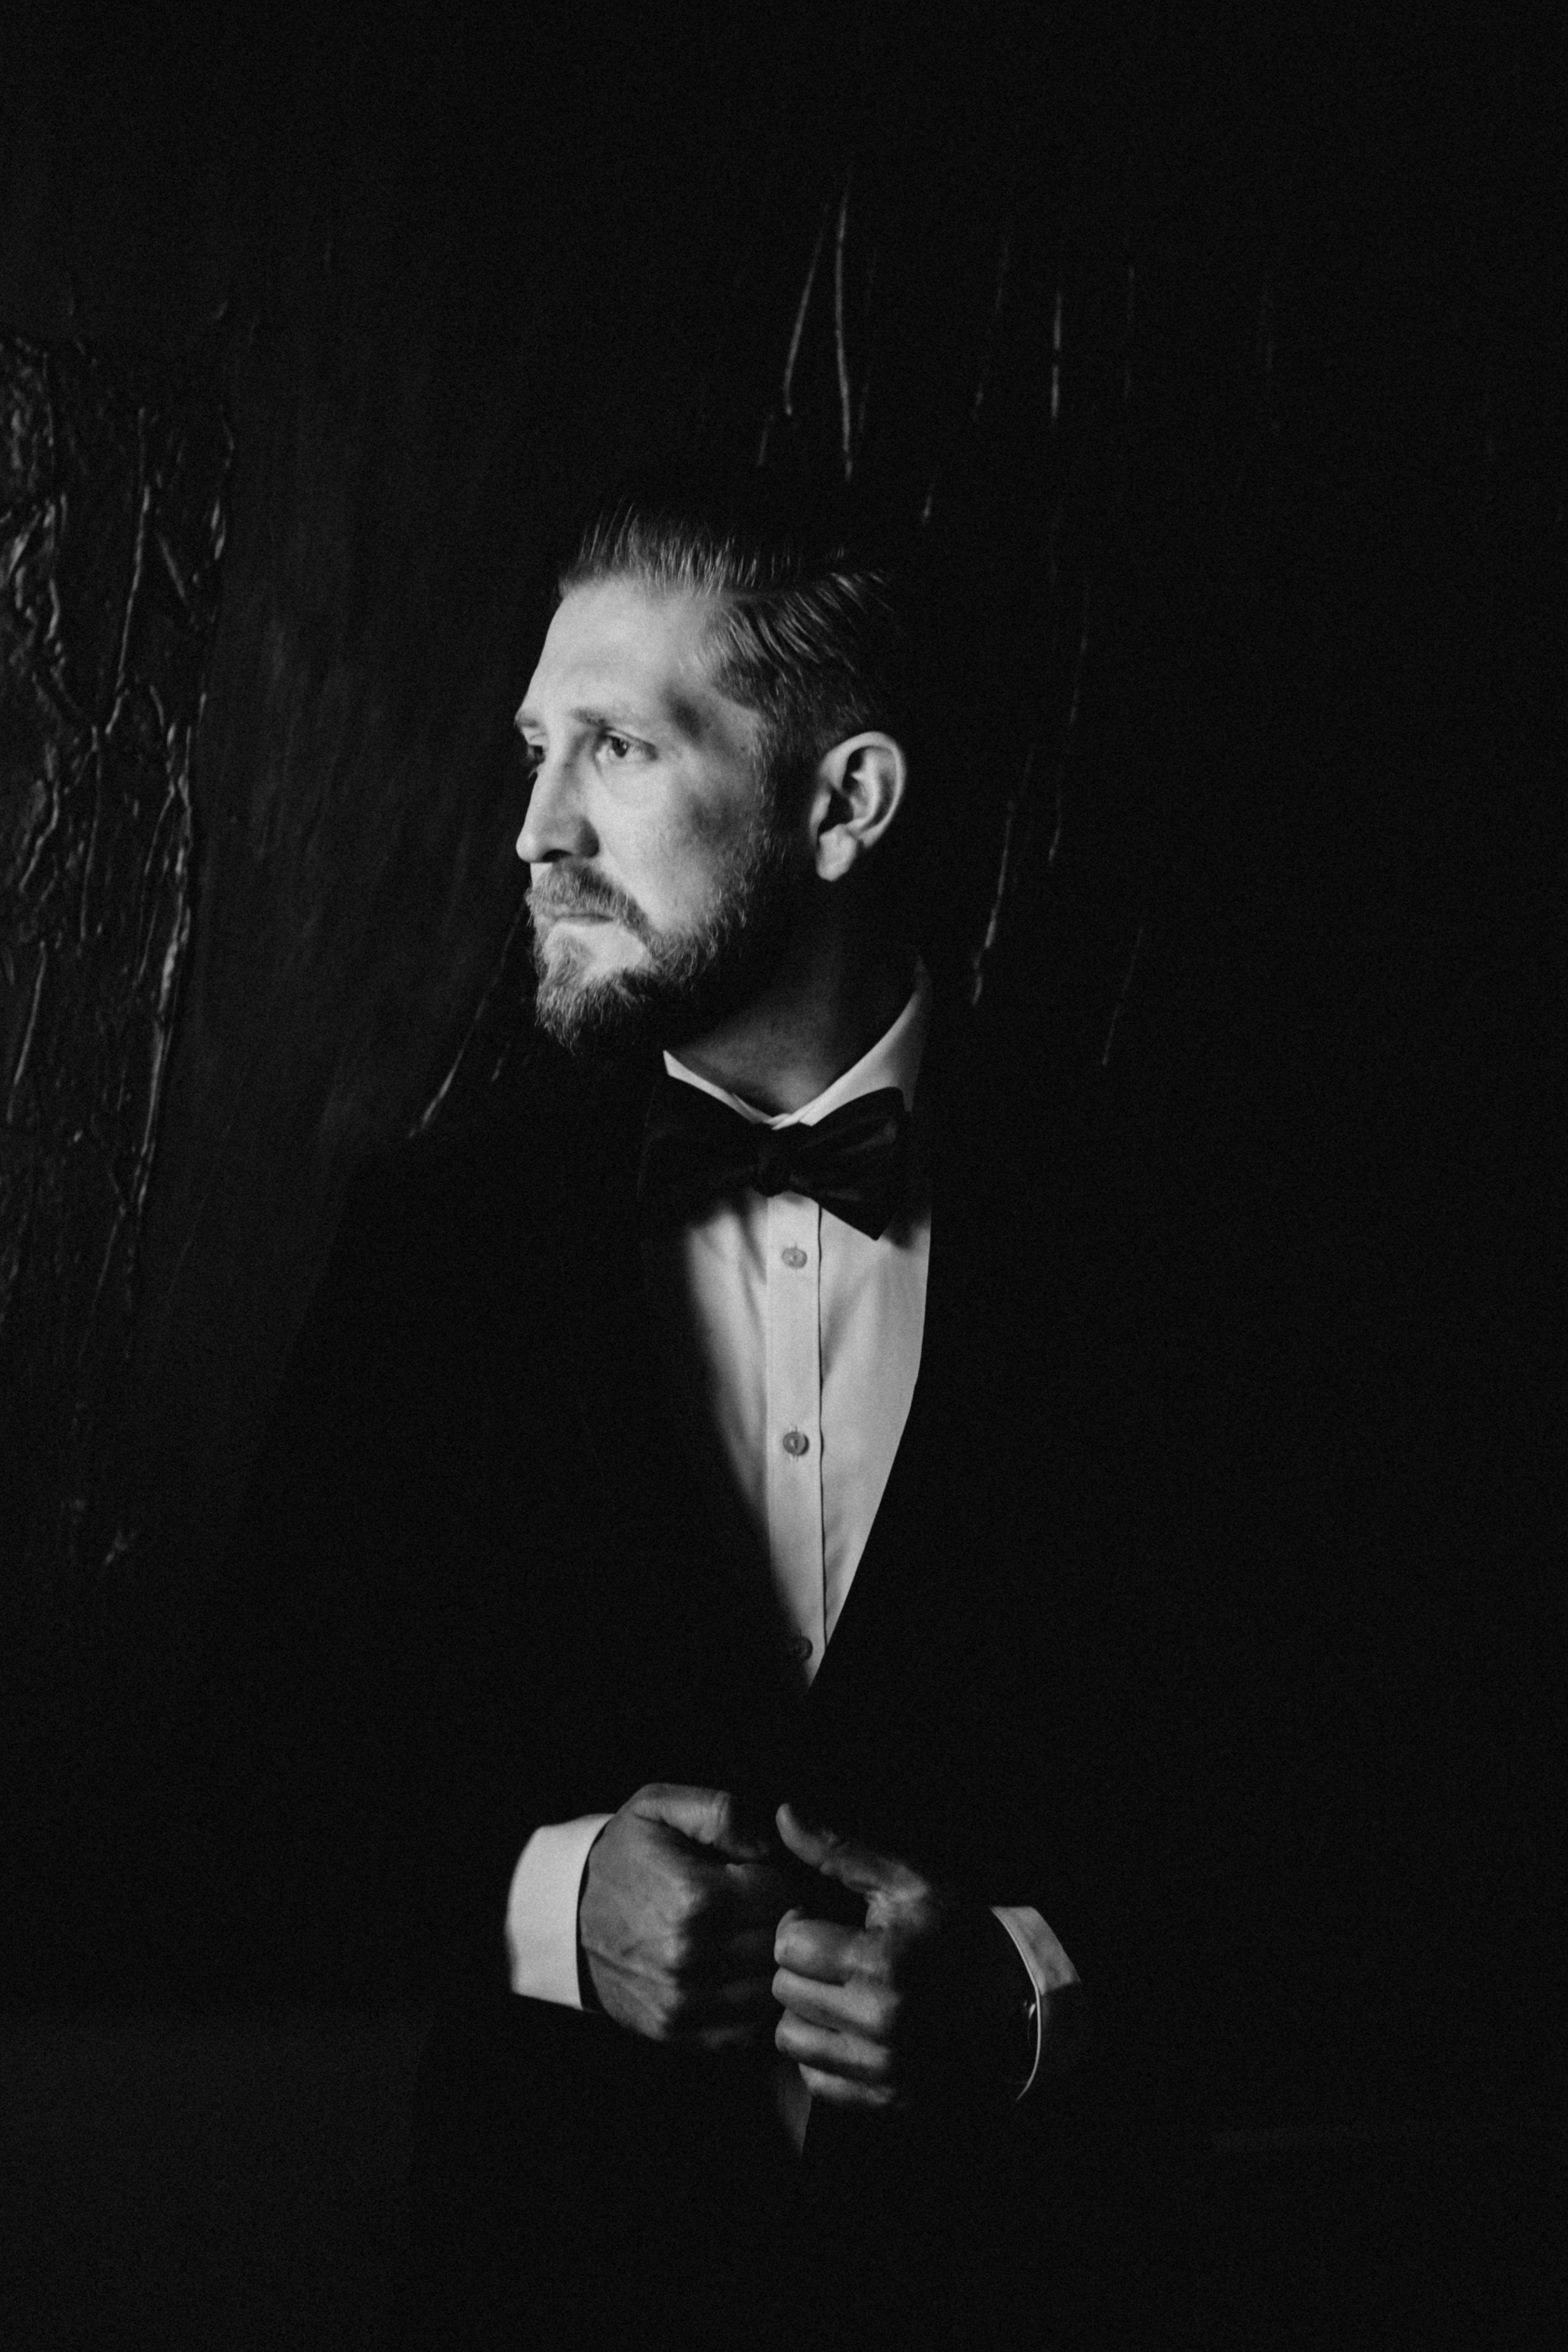 moody wedding photographers chicago illinois